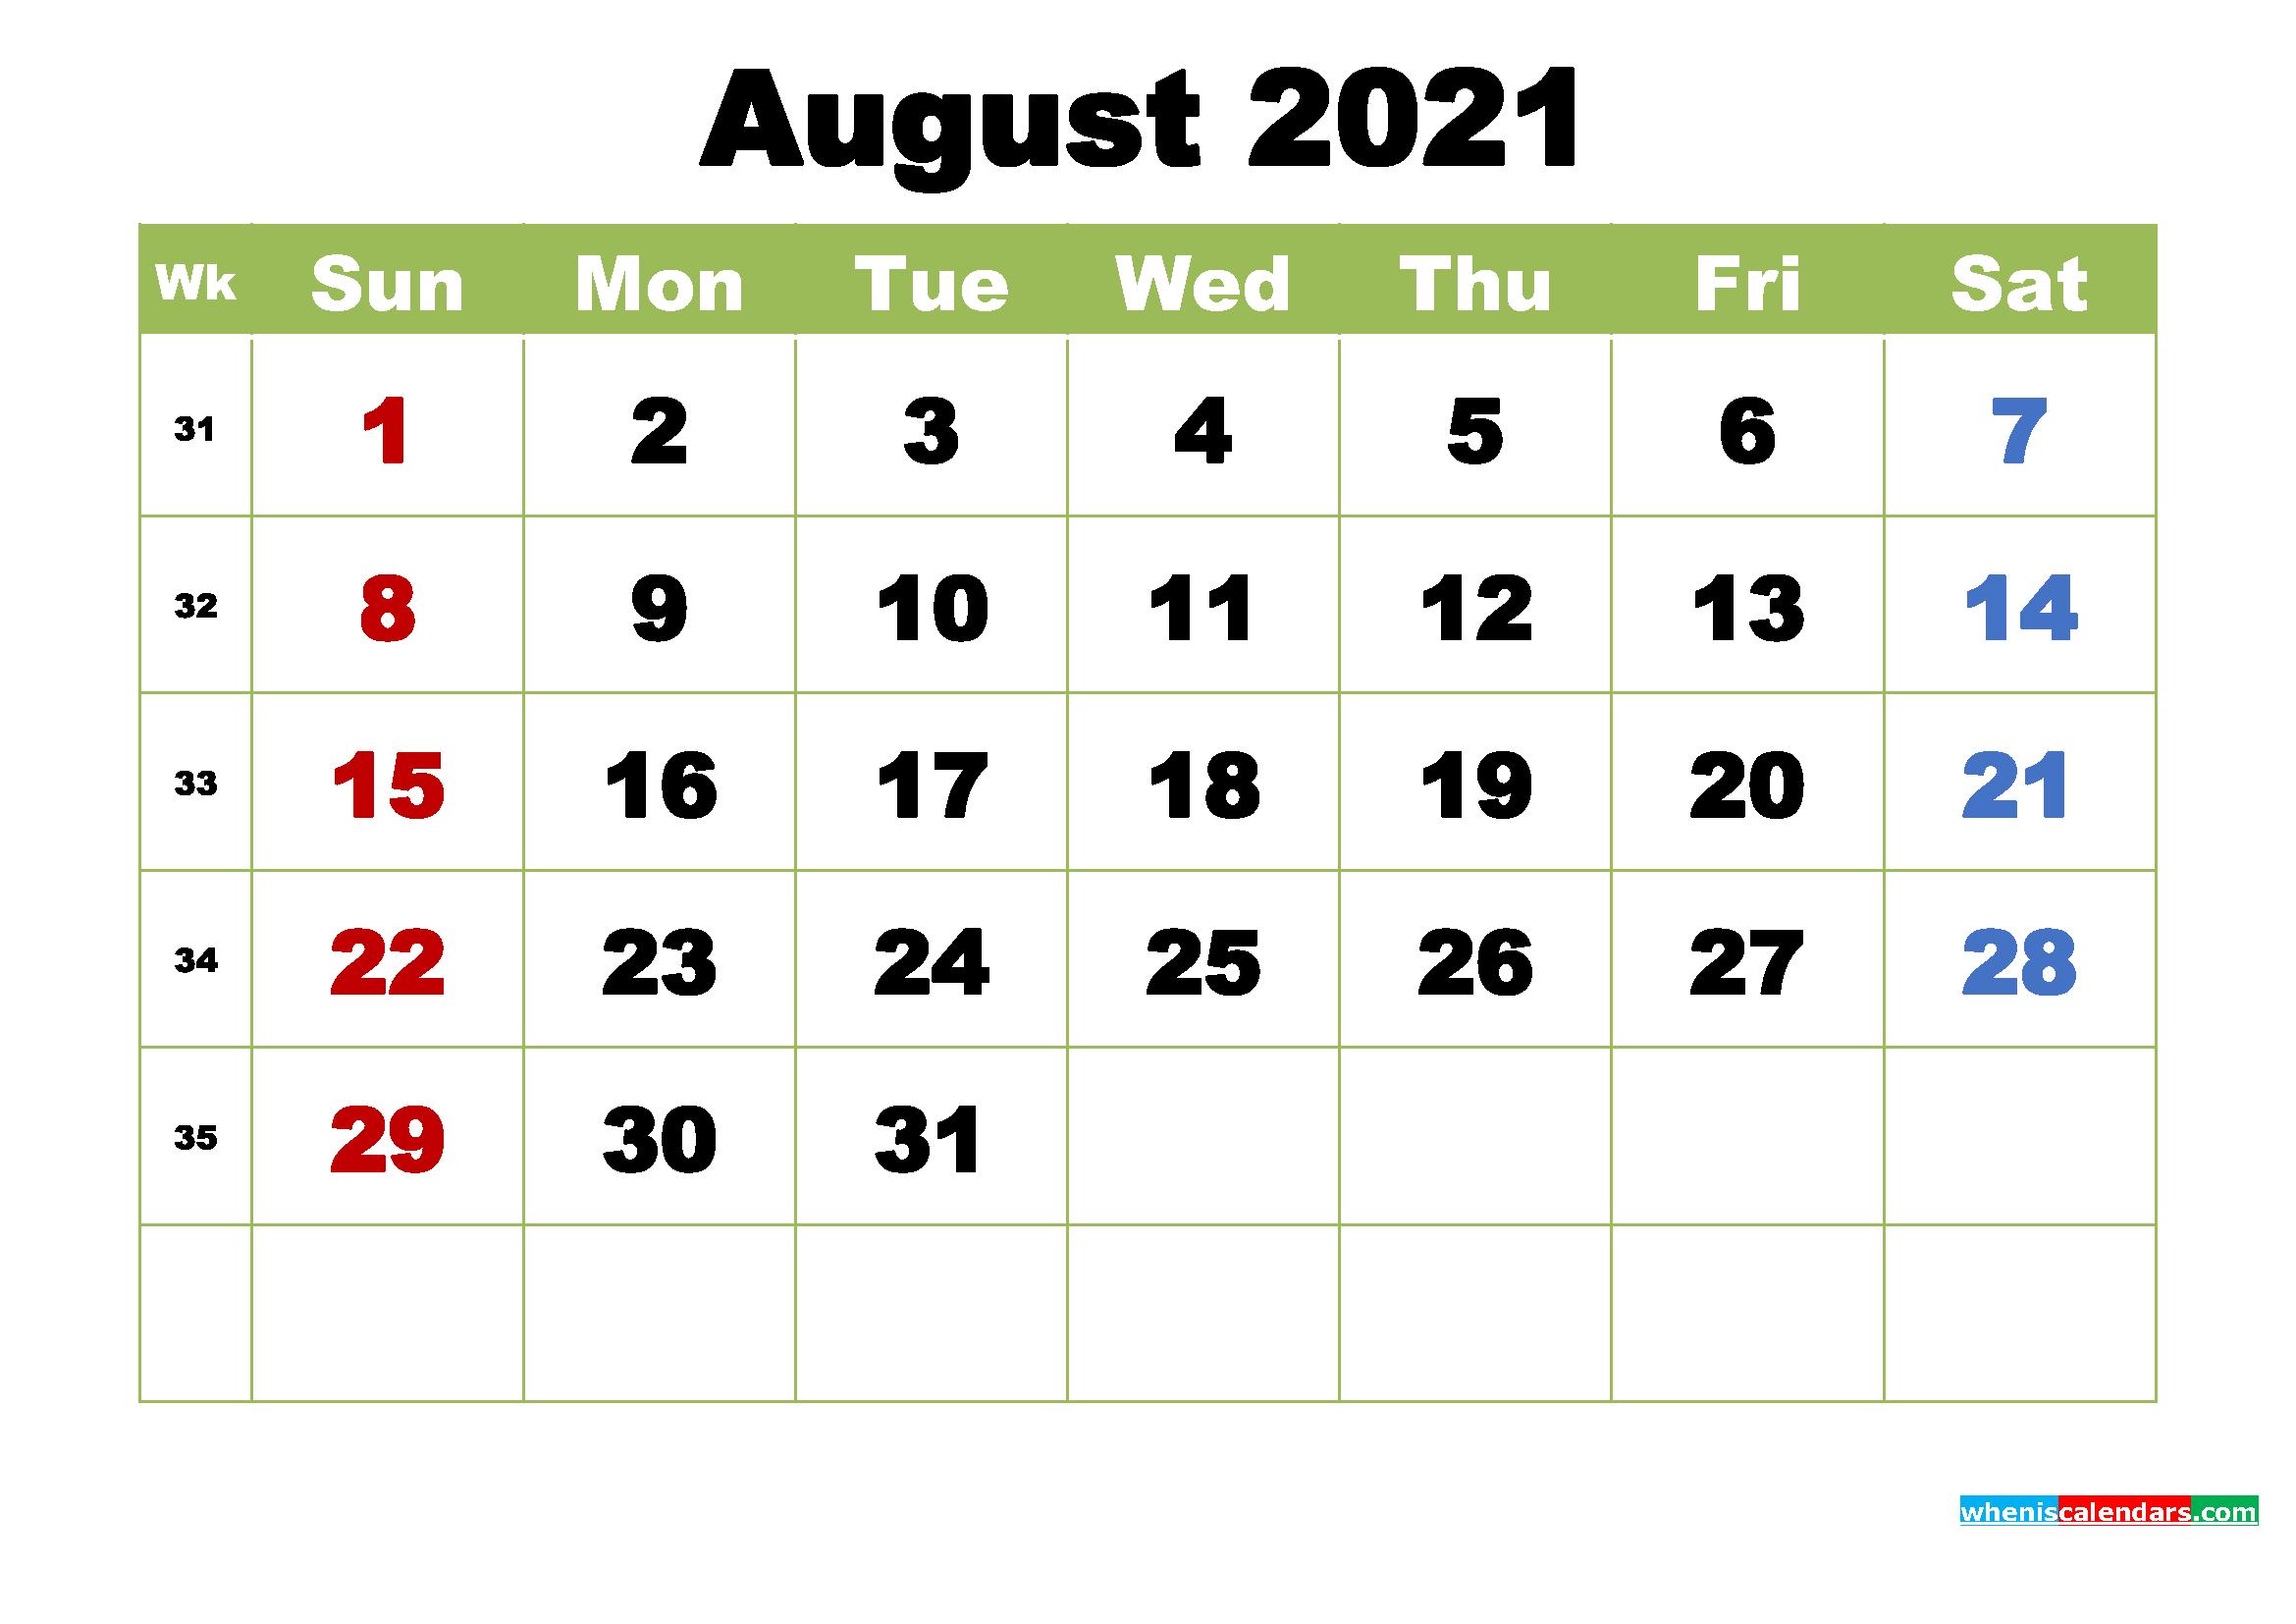 August 2021 Calendar with Holidays Wallpaper